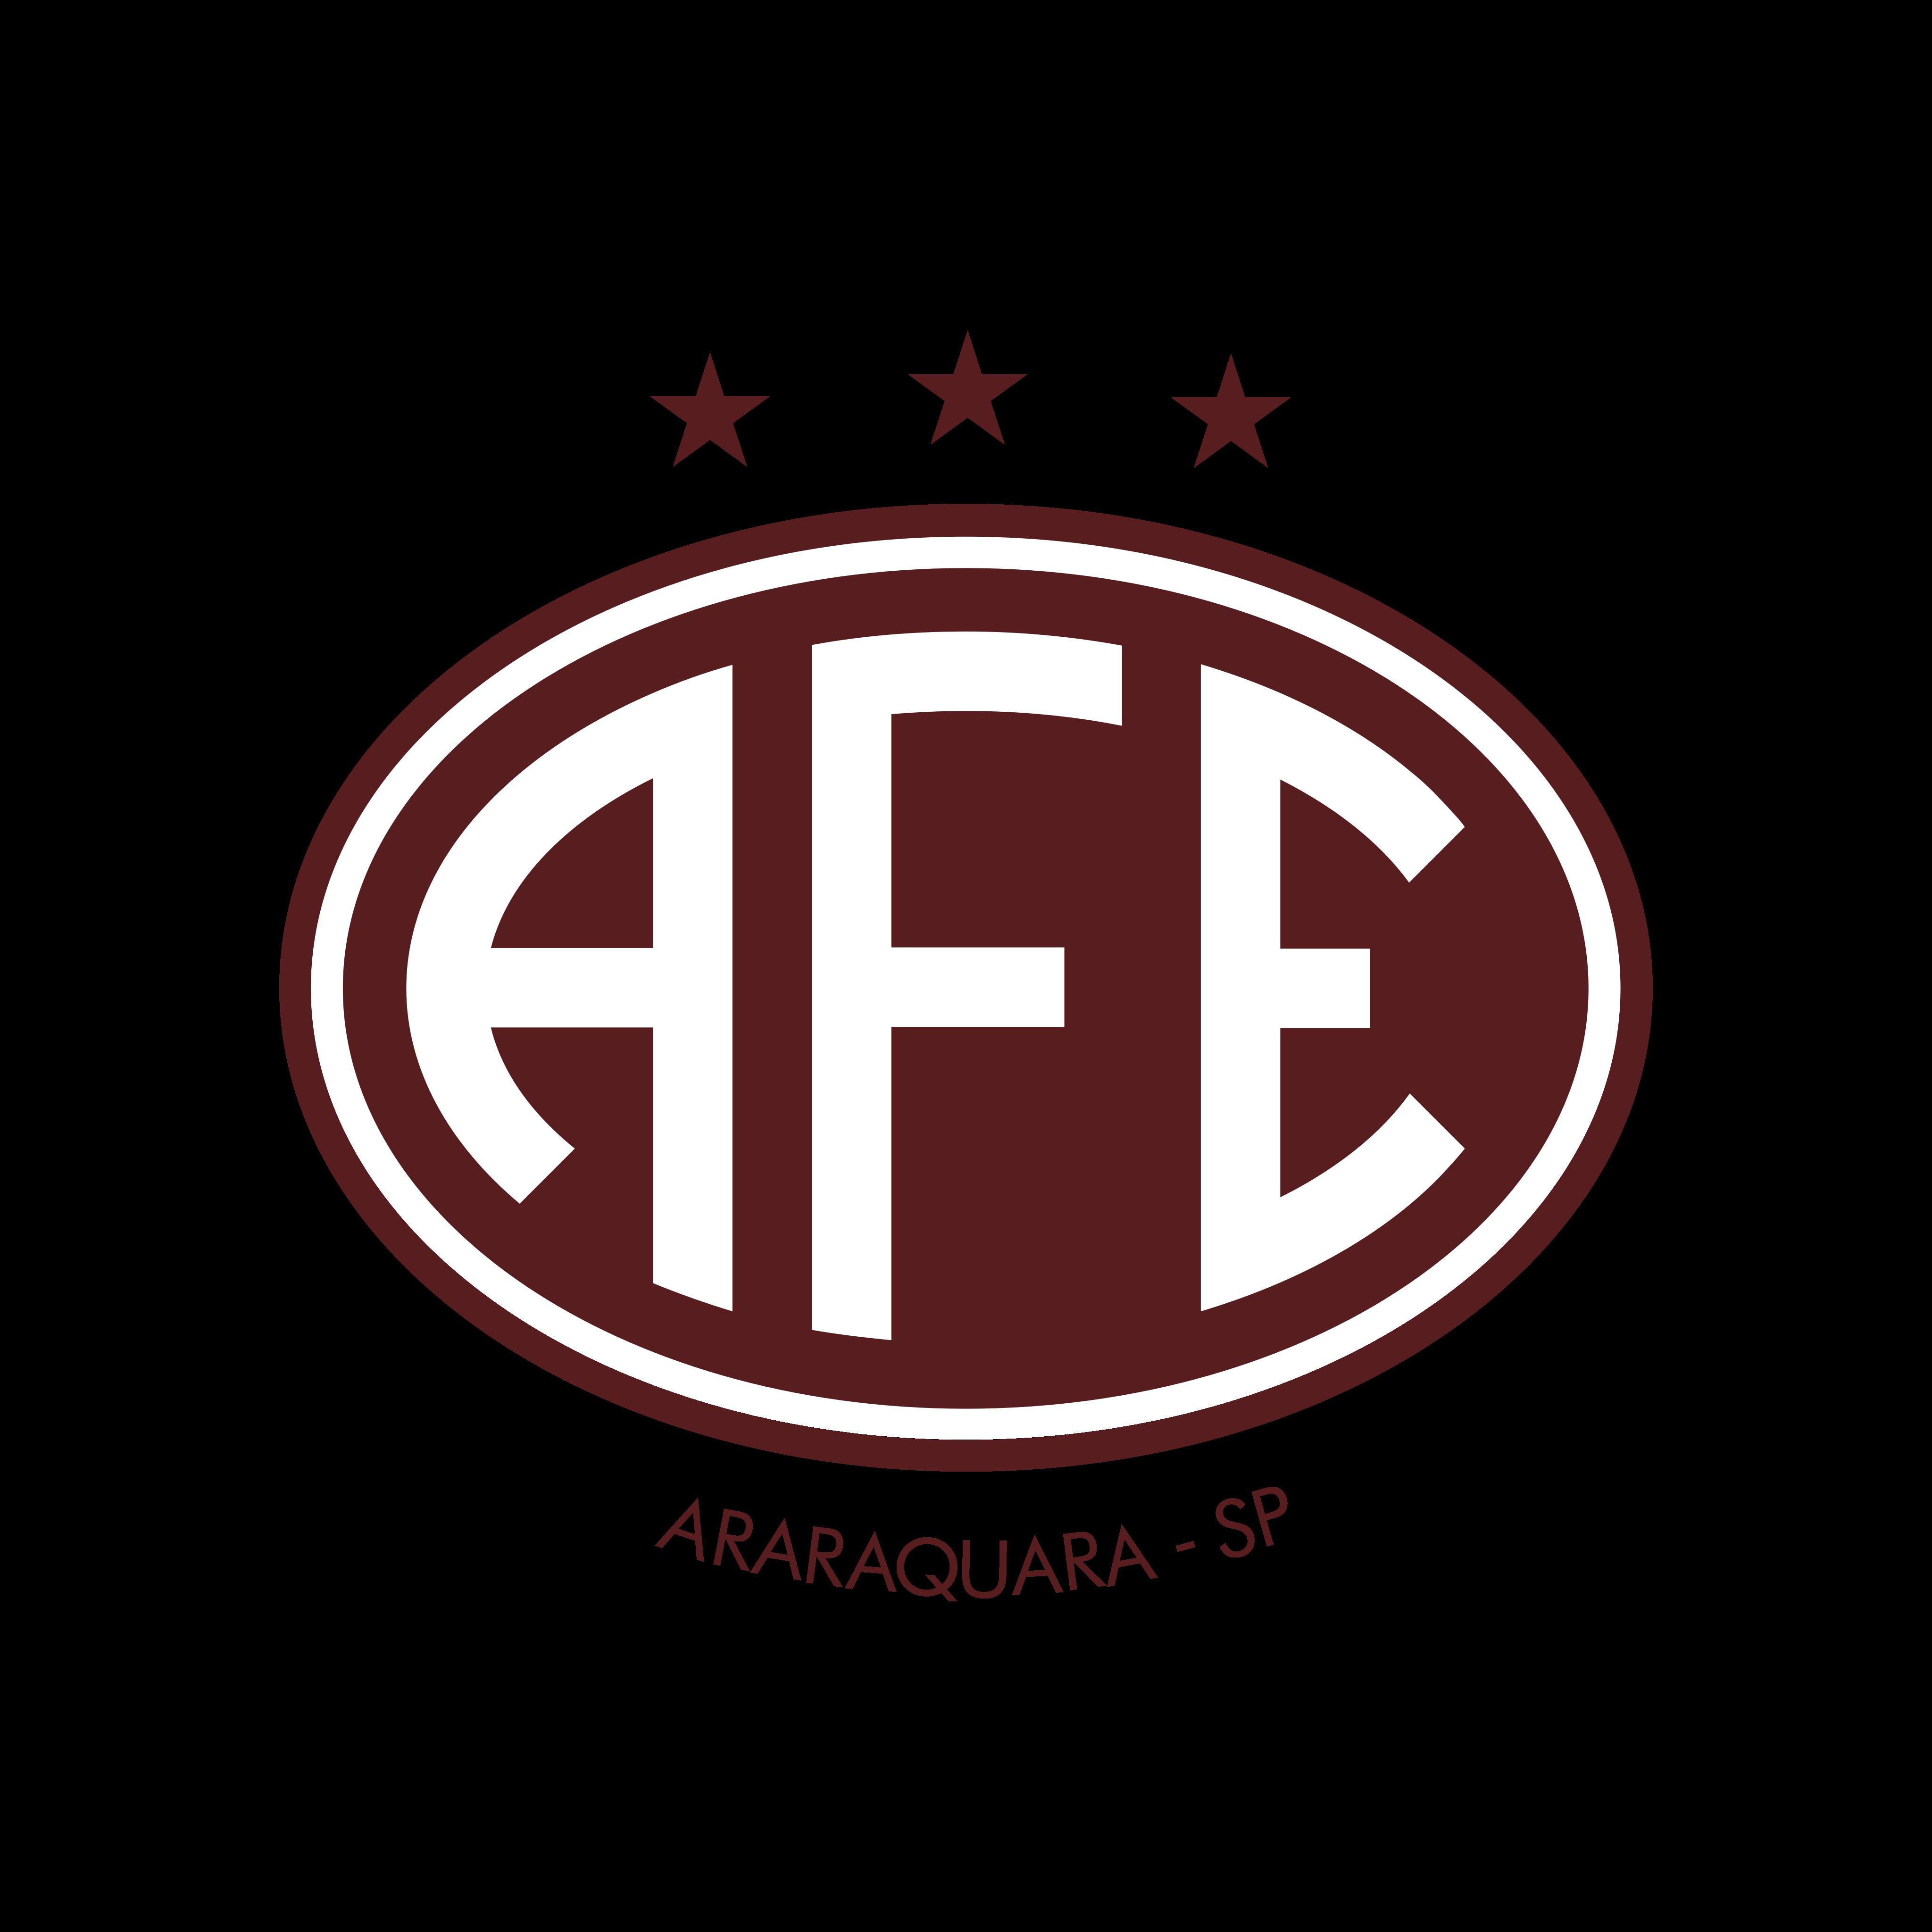 ferroviaria araraquara logo 0 - Ferroviária Araraquara Logo